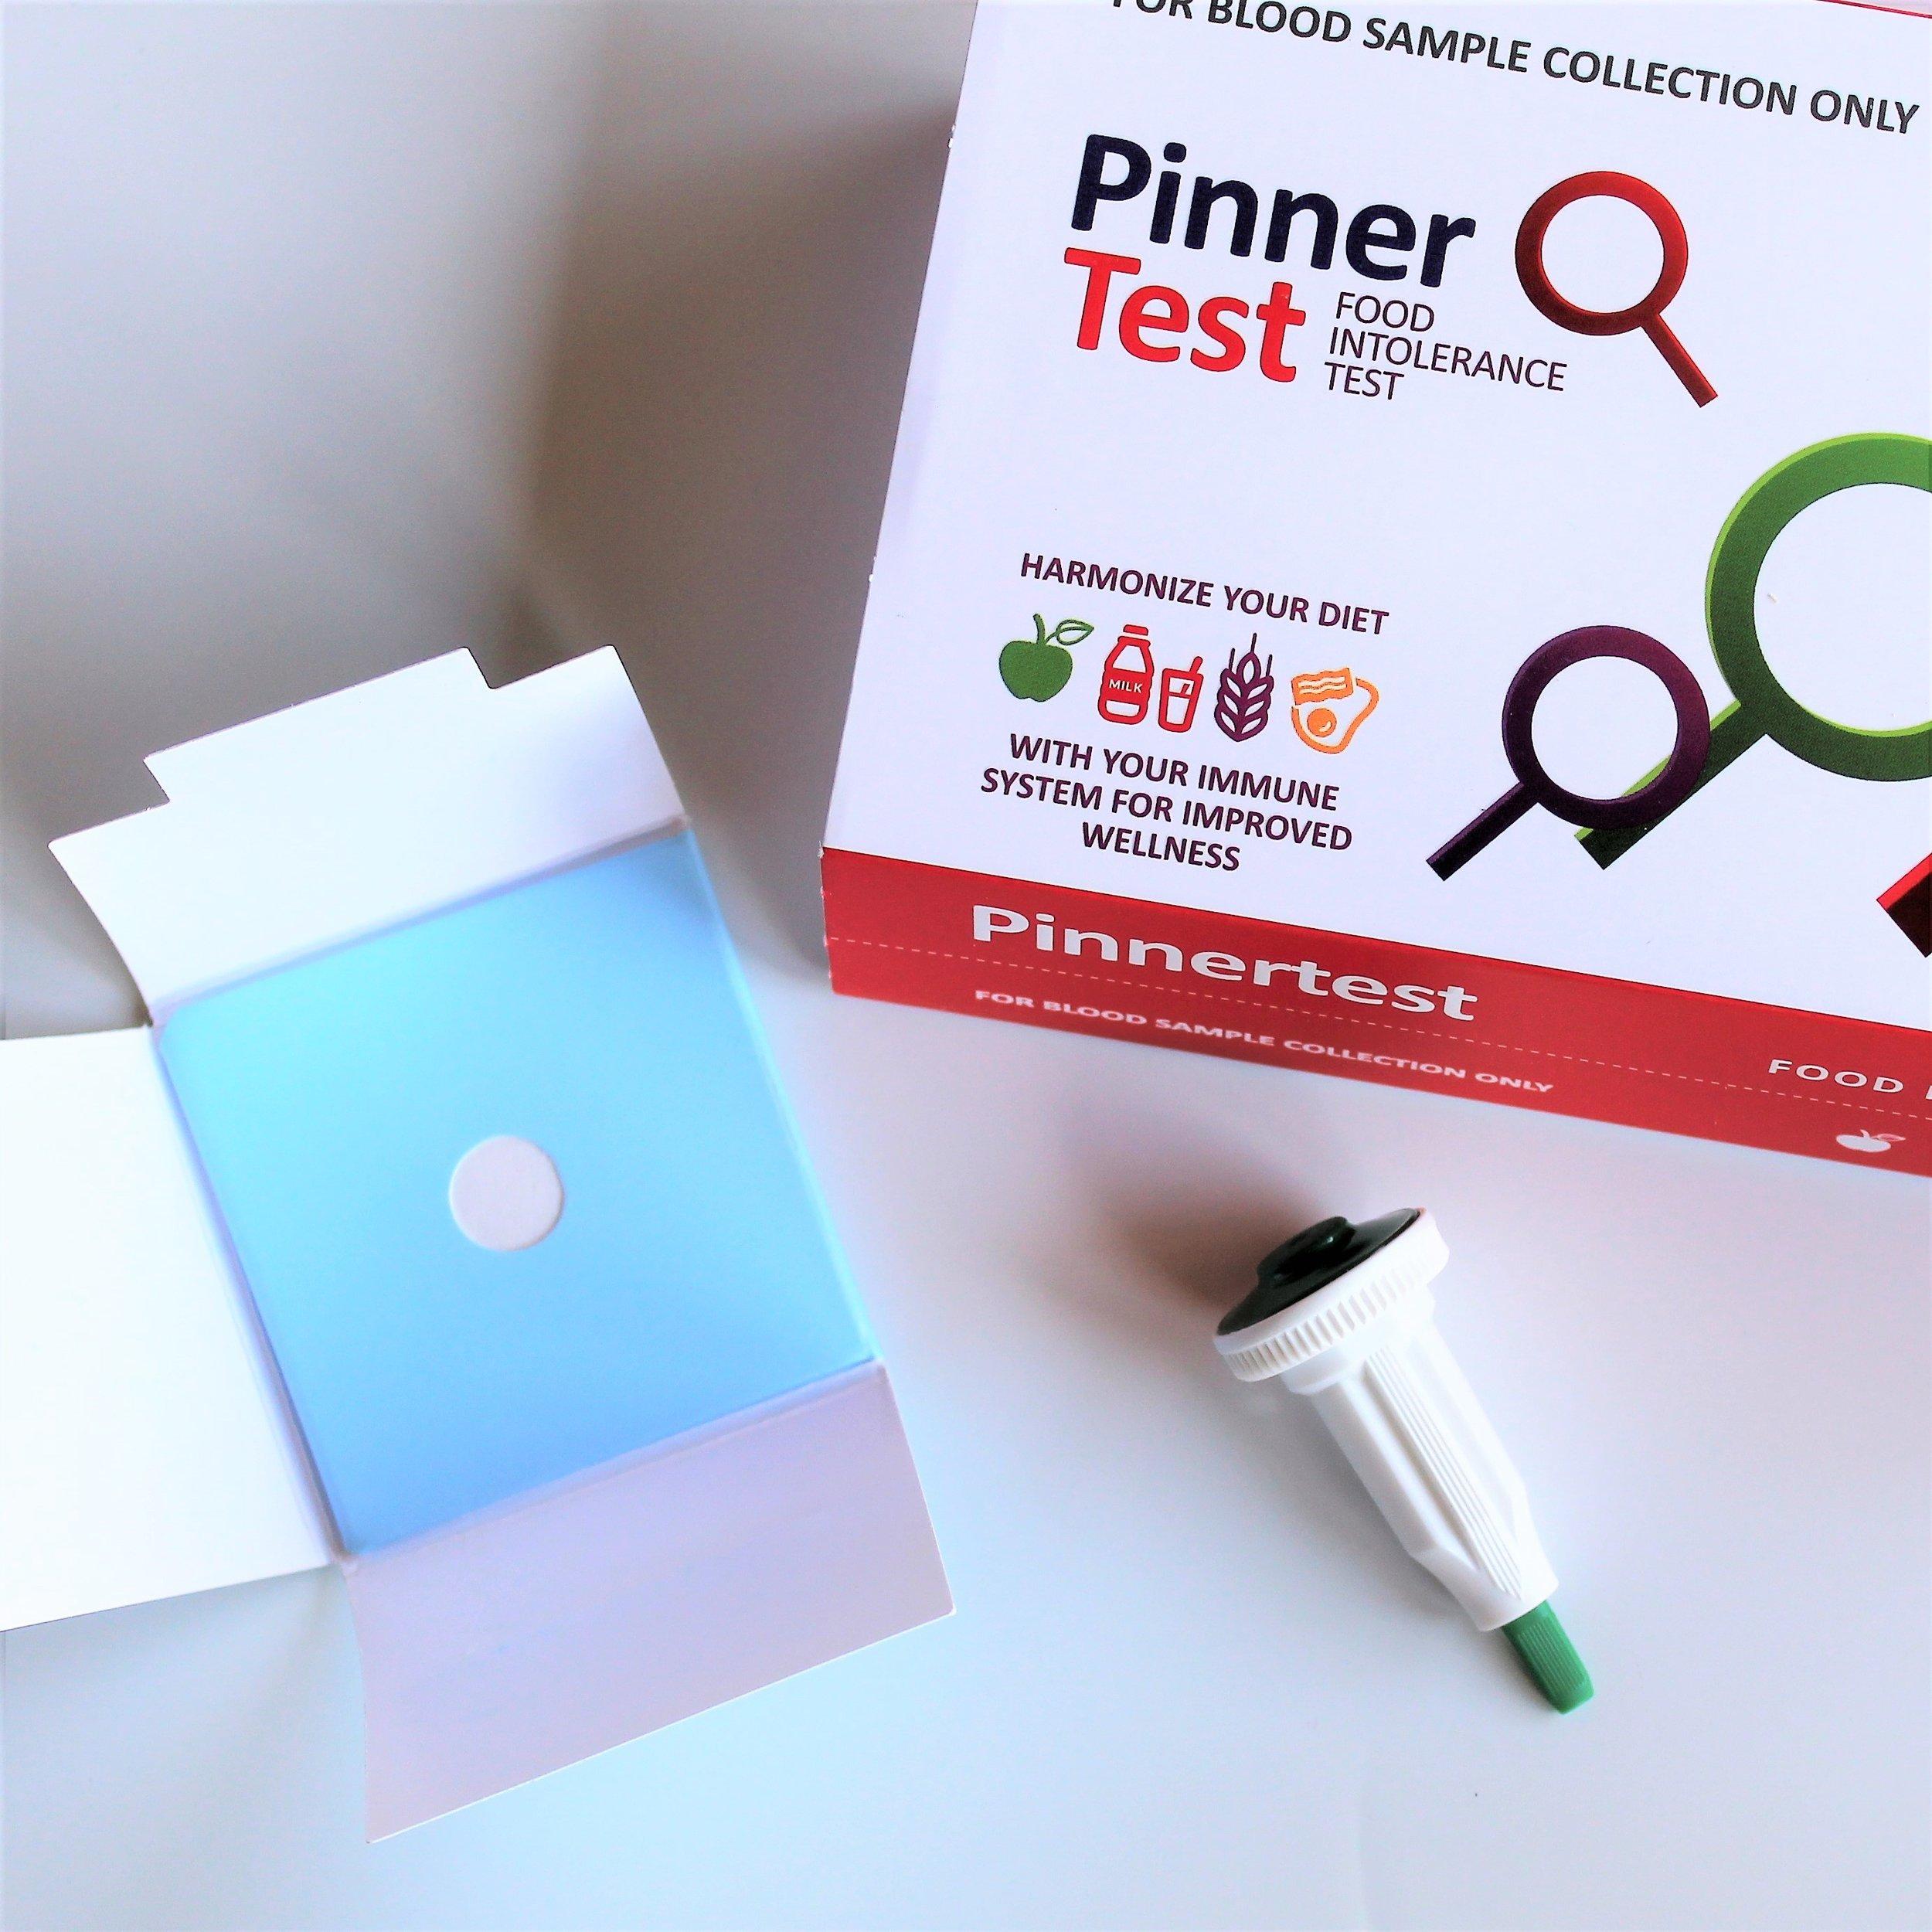 pinner test food intolerance test box